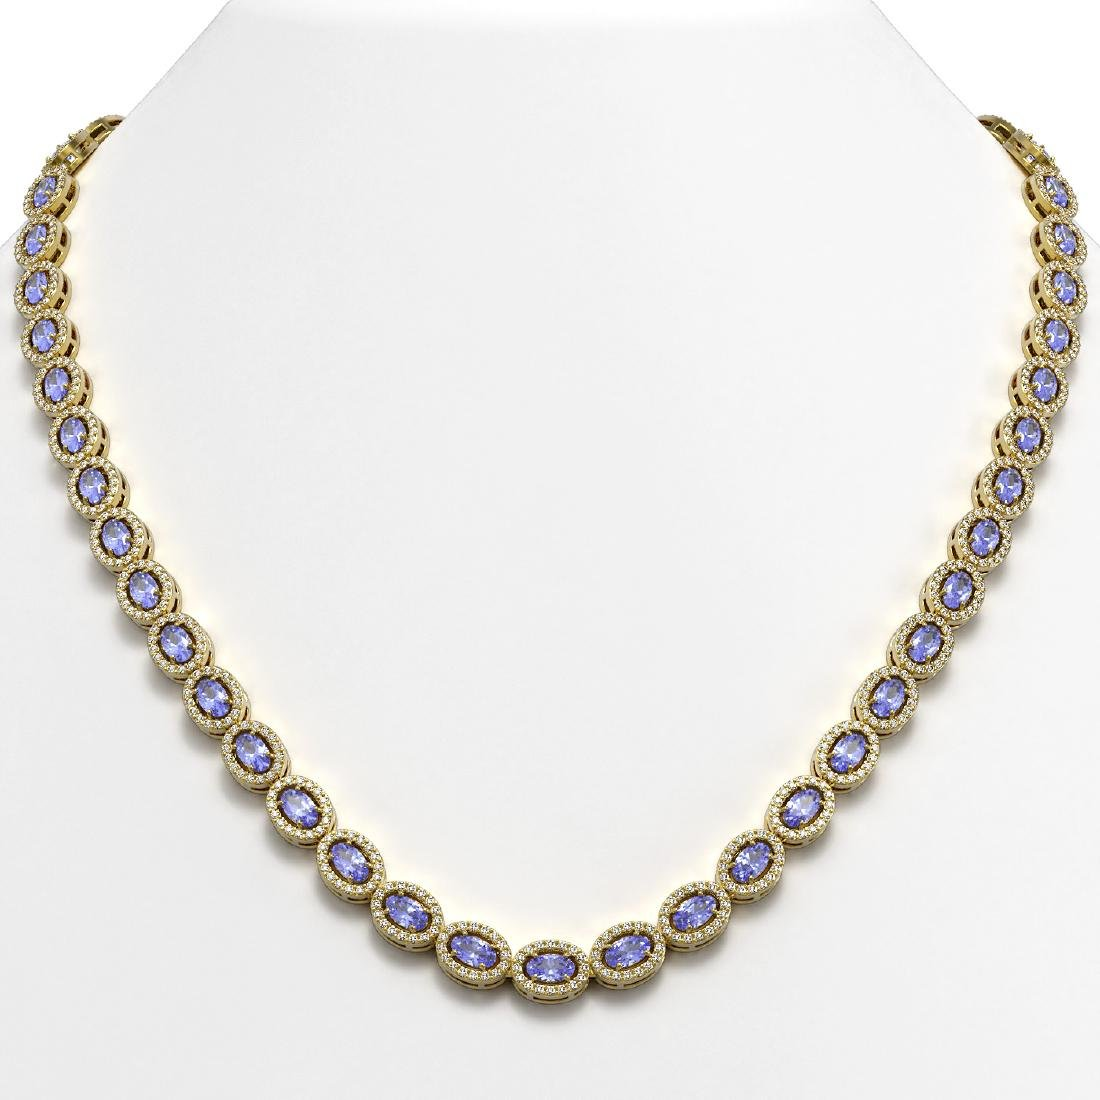 22.62 CTW Tanzanite & Diamond Halo Necklace 10K Yellow